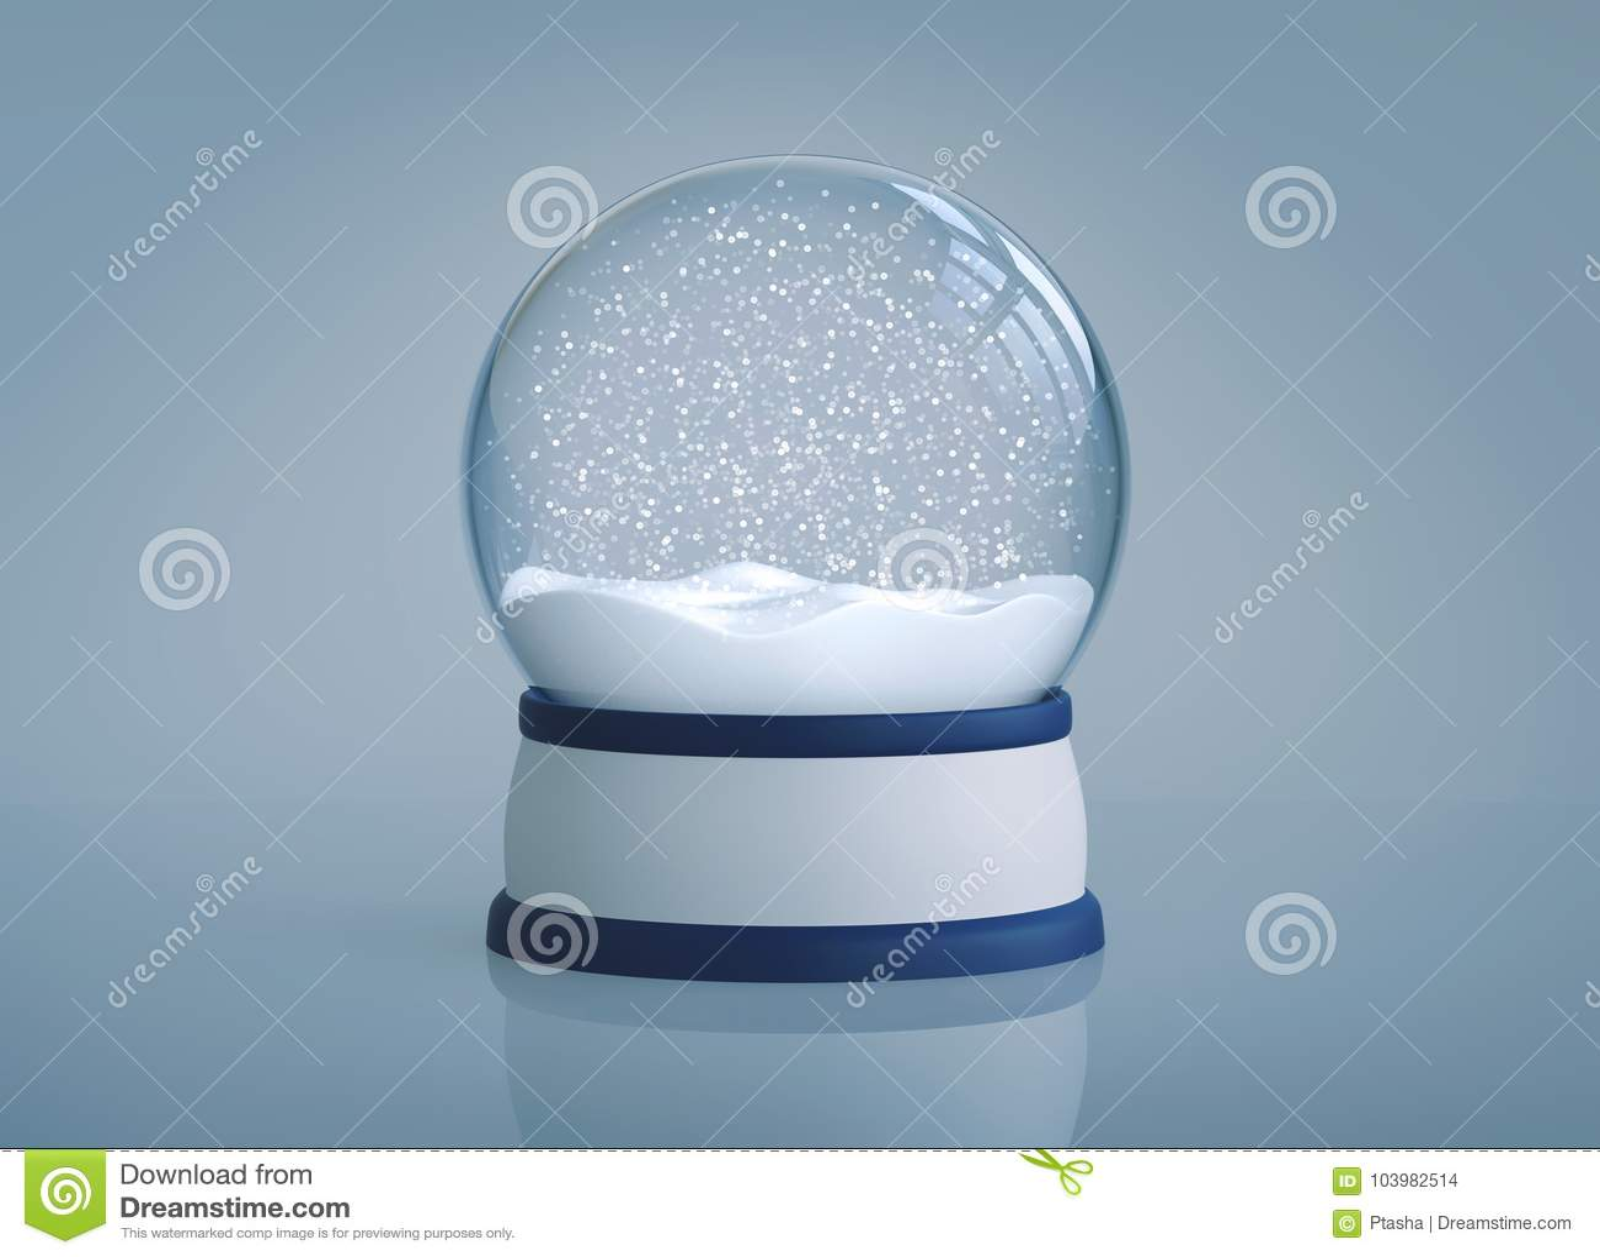 Christmas snow globe on blue background